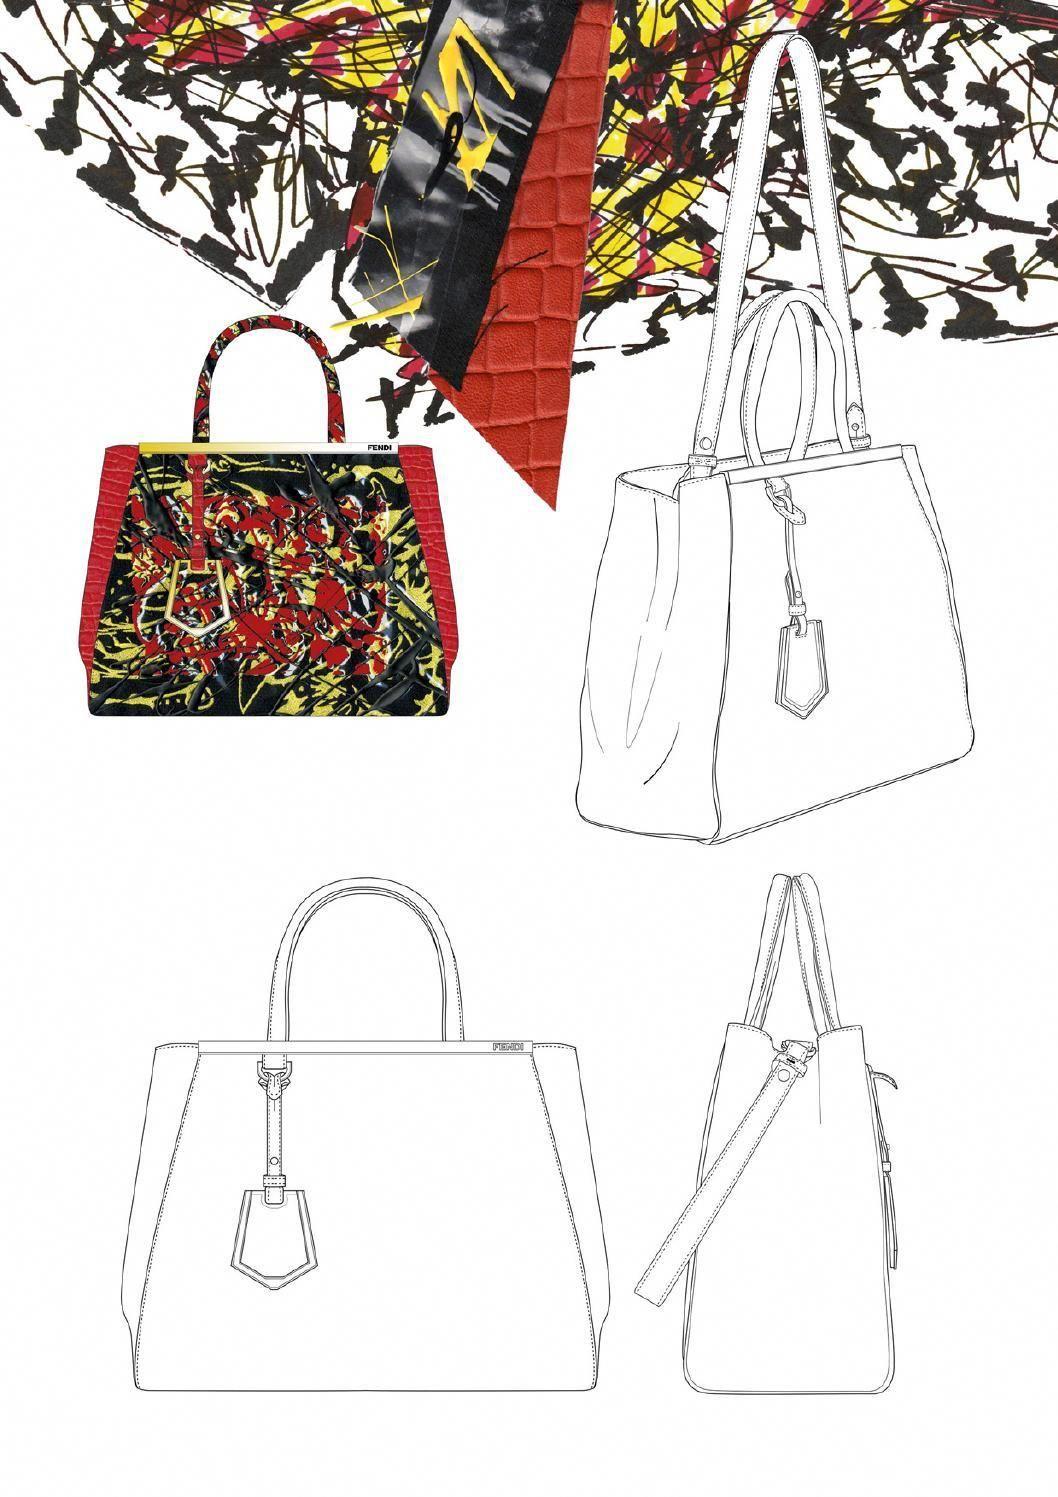 Fashion L Hairanotahfashion Store Bolsos de diseño